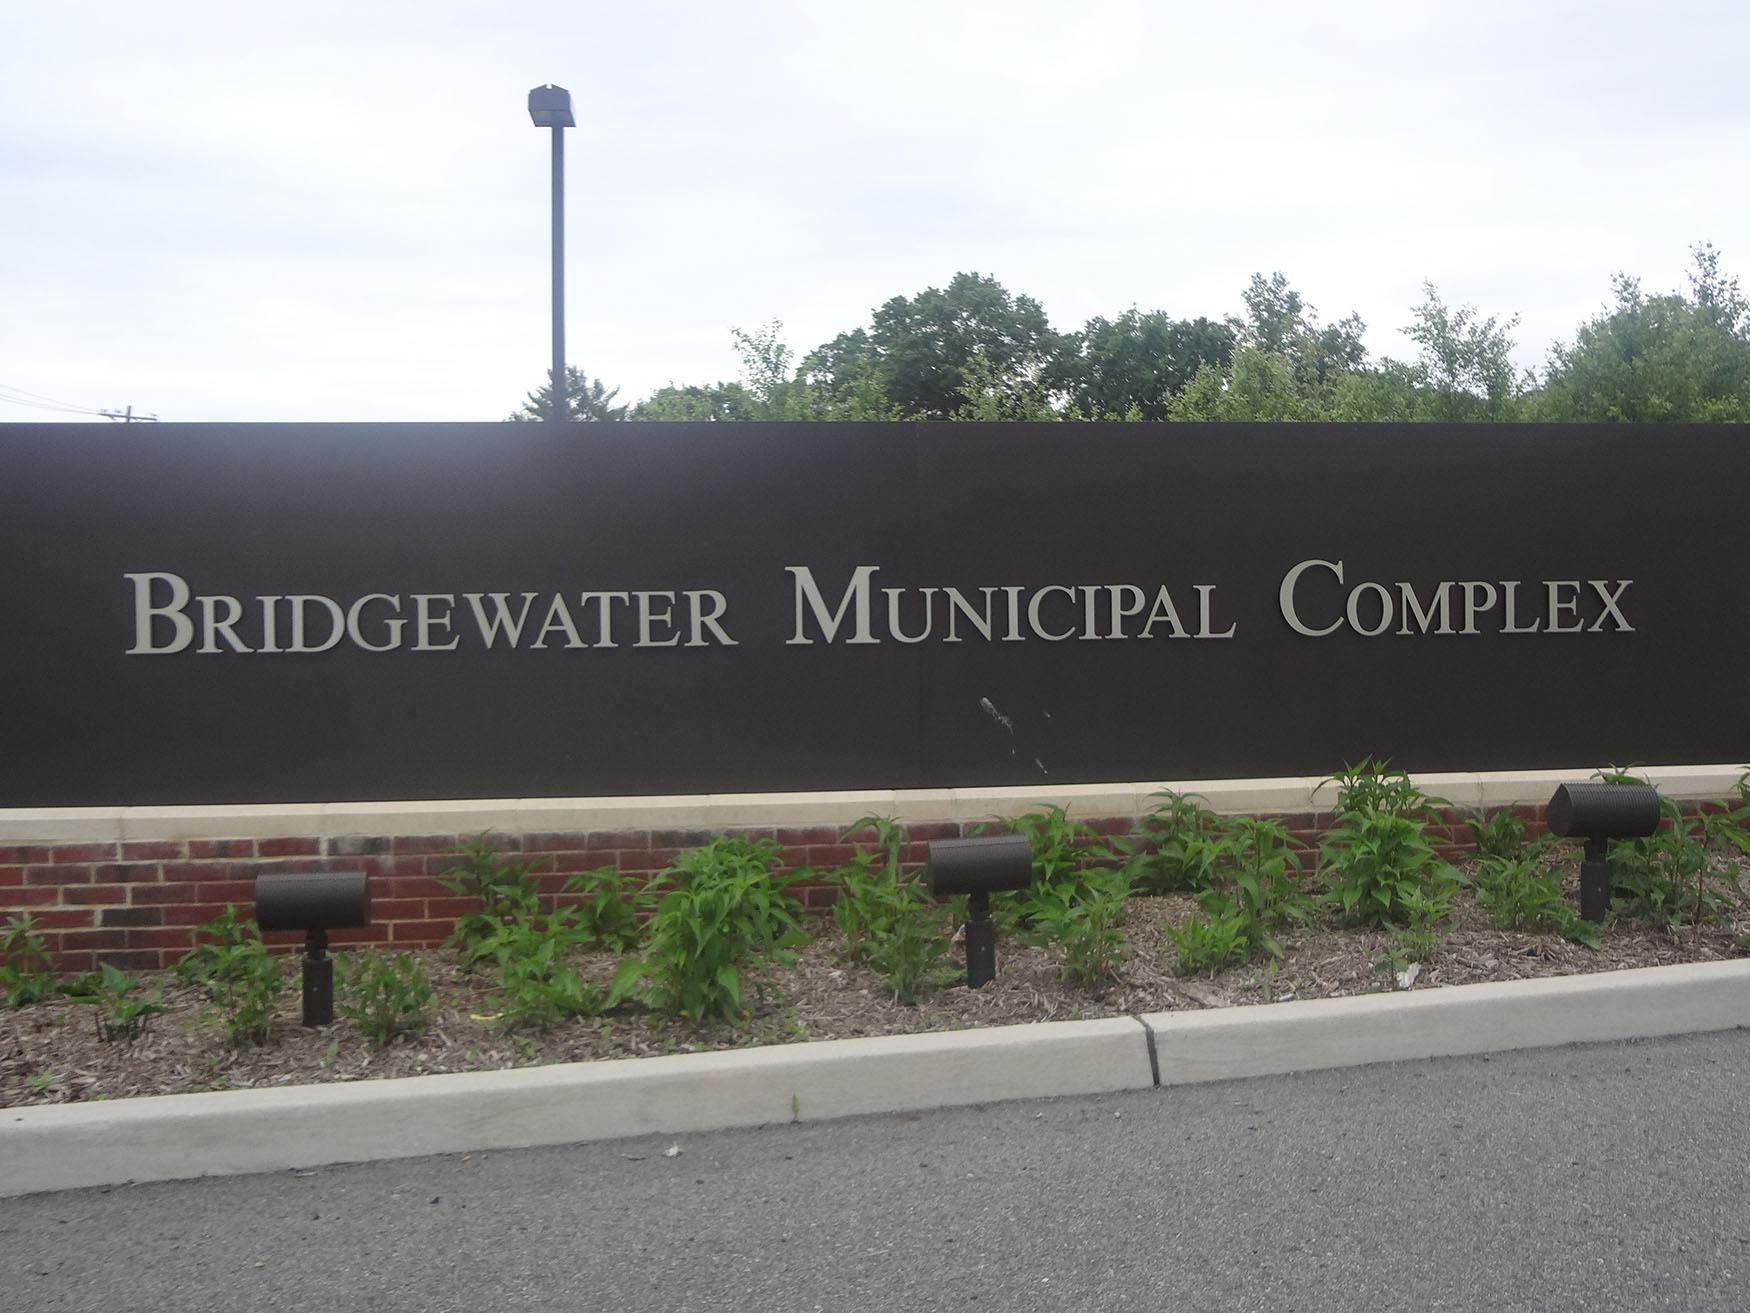 8c21a8264ef93b8c05e8_Bridgewater_municipal.jpg